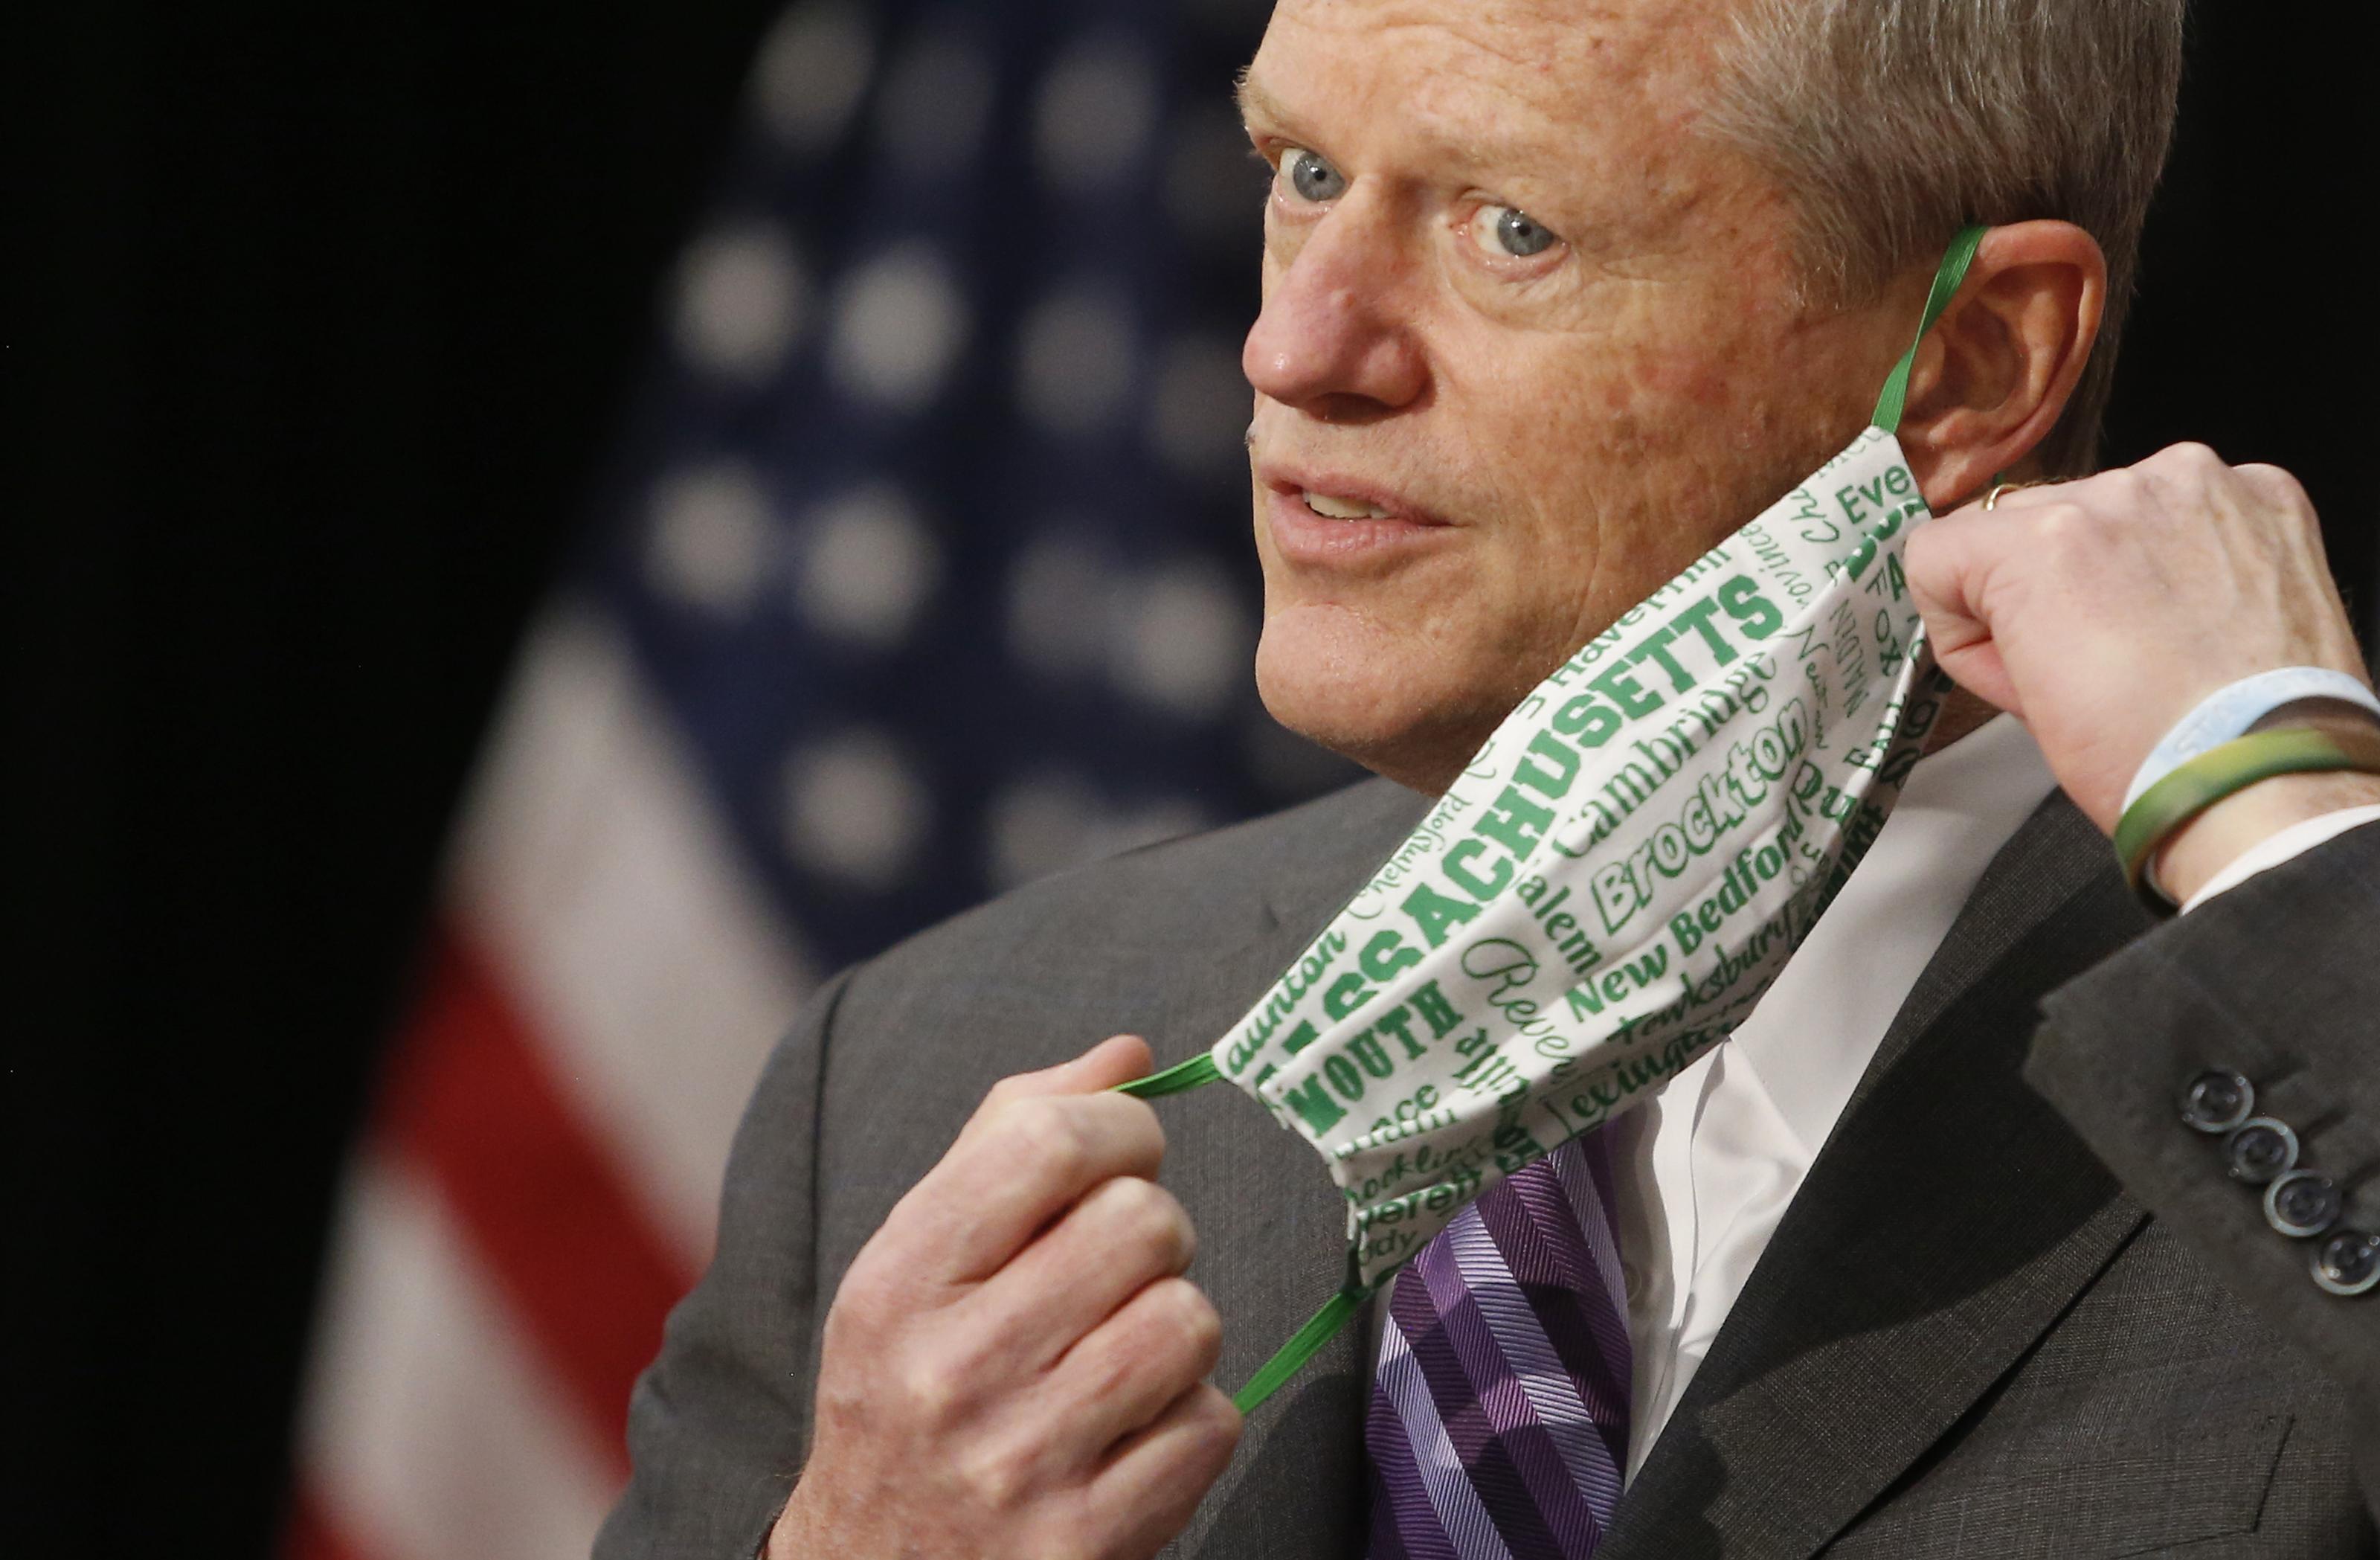 Gobernador dice que Massachusetts actualizará plan de reapertura la próxima semana